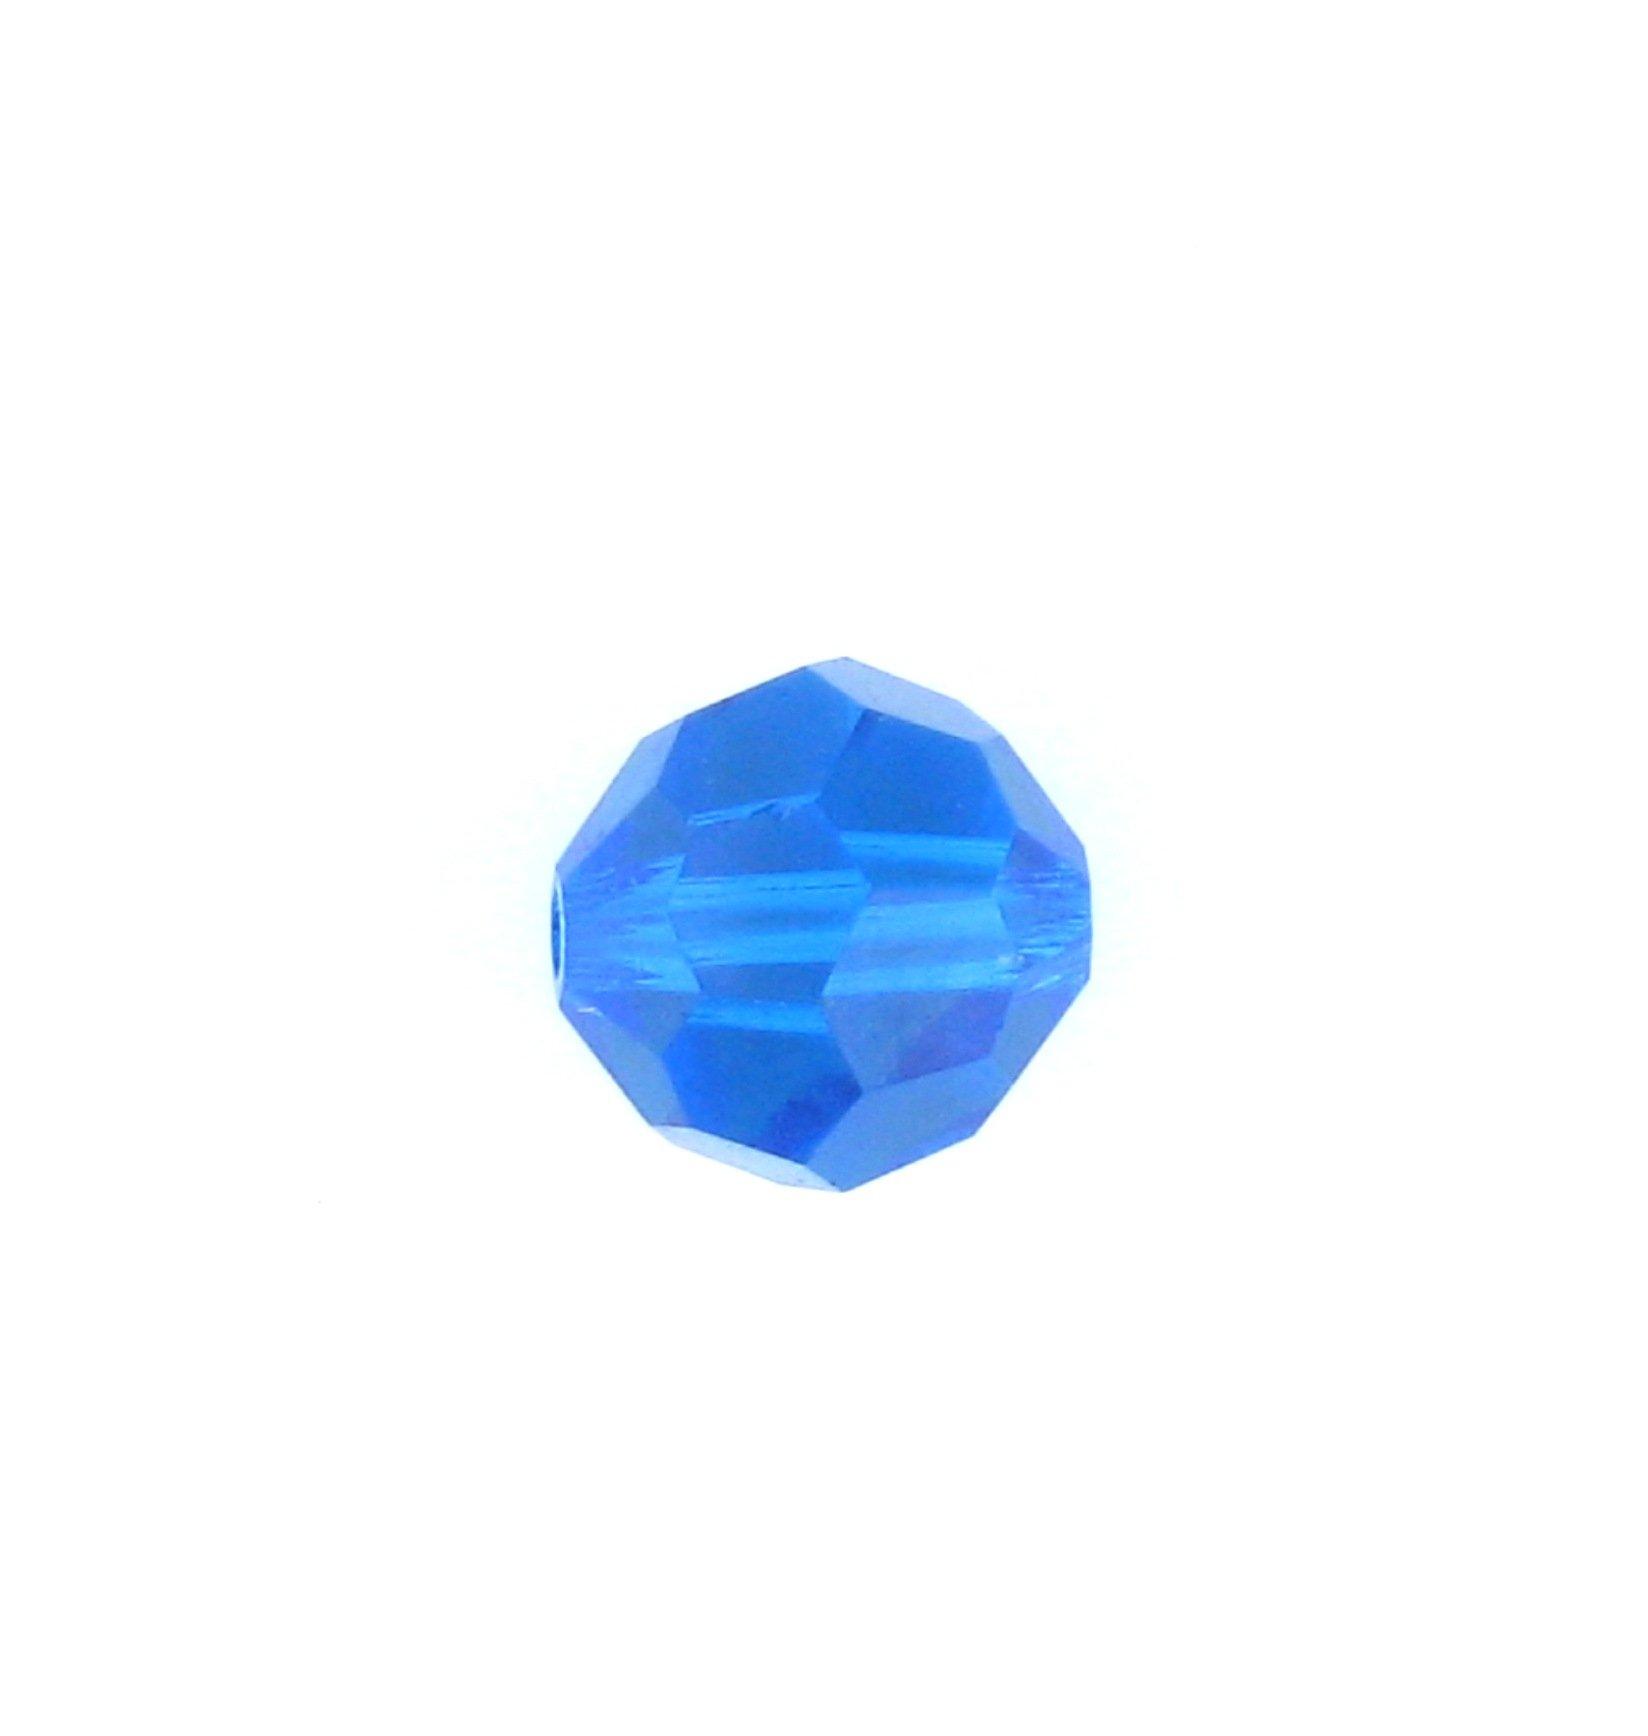 5d1da85a7 5000 - 4mm Swarovski Round Crystal - Capri Blue   Crystal Findings